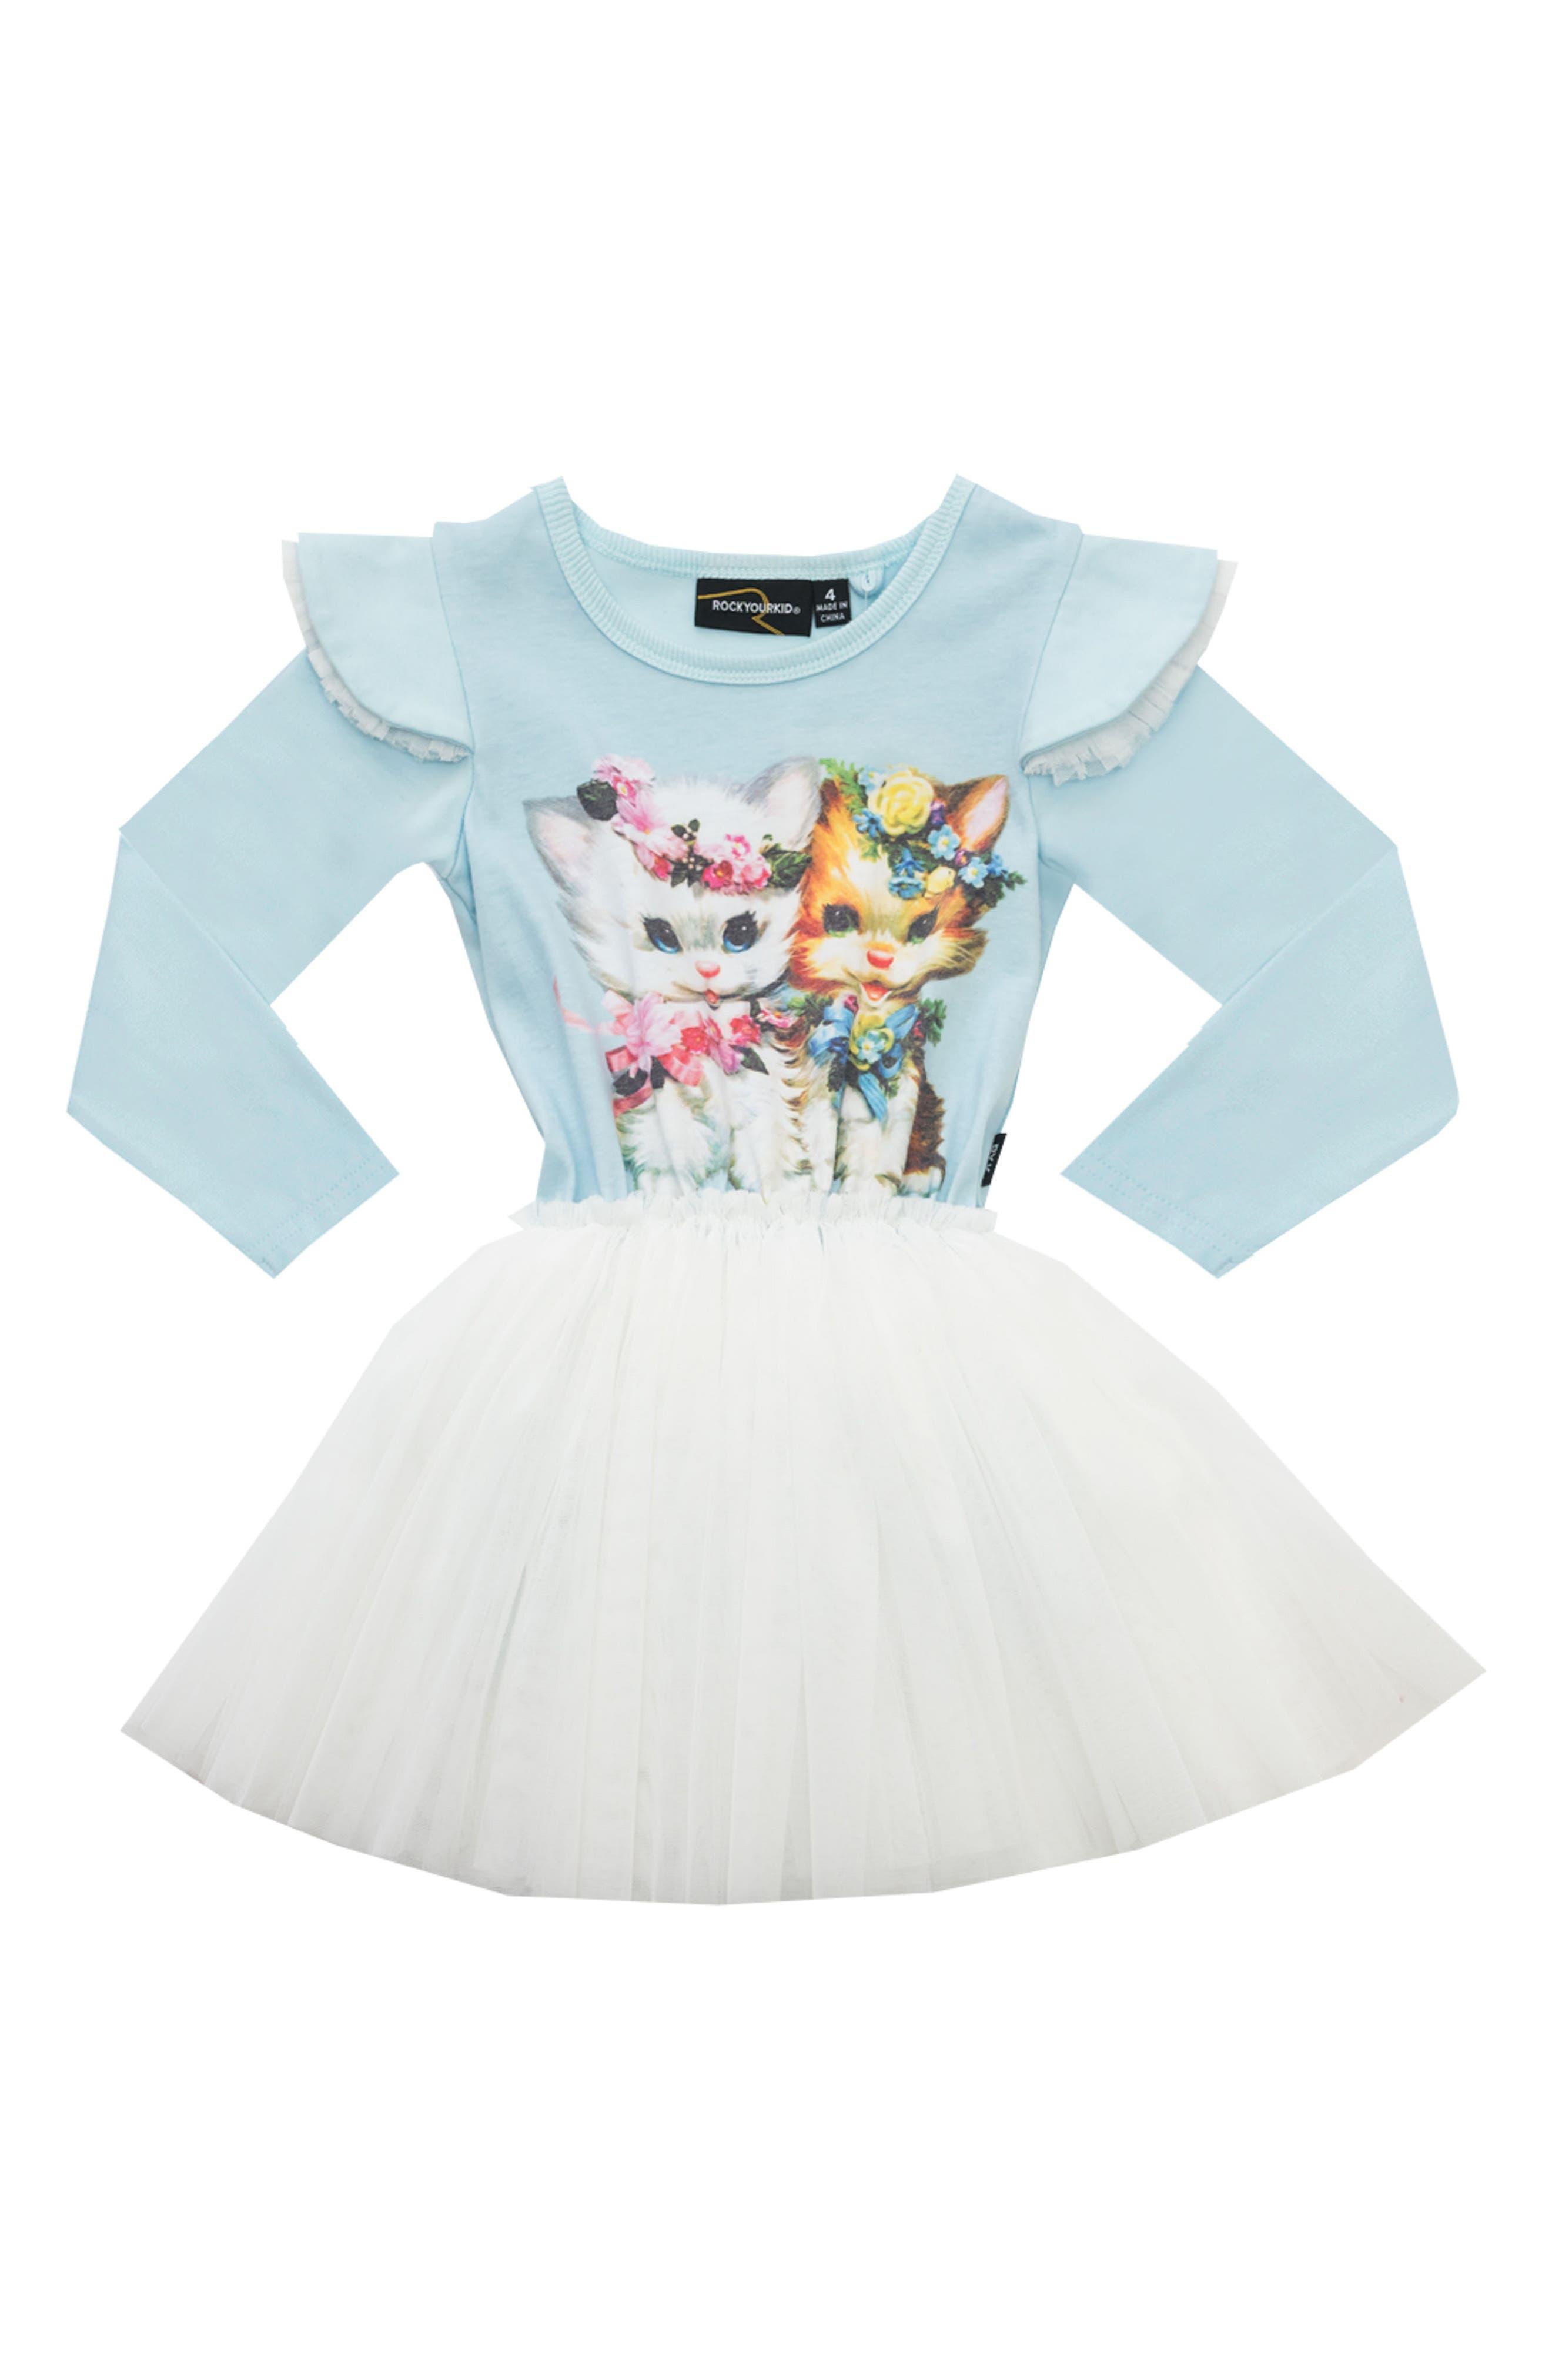 Lulu & Lola Circus Dress,                         Main,                         color, Blue